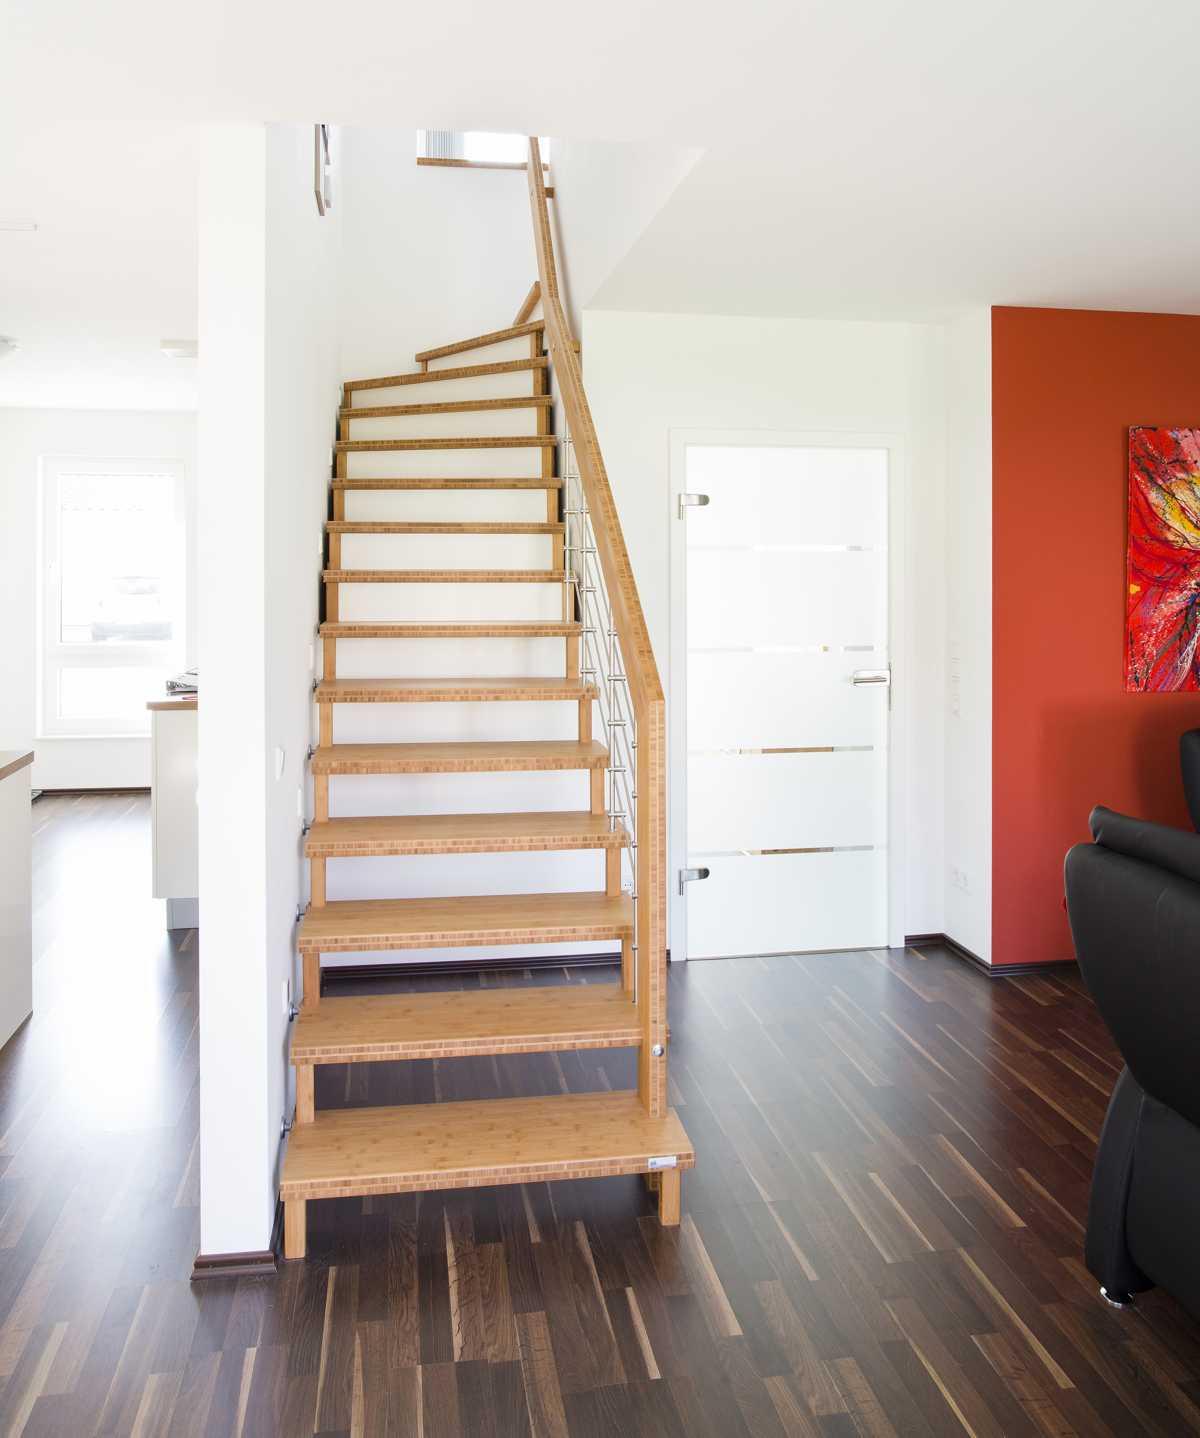 arcus treppen awesome kenngott stairs treppen architektur. Black Bedroom Furniture Sets. Home Design Ideas